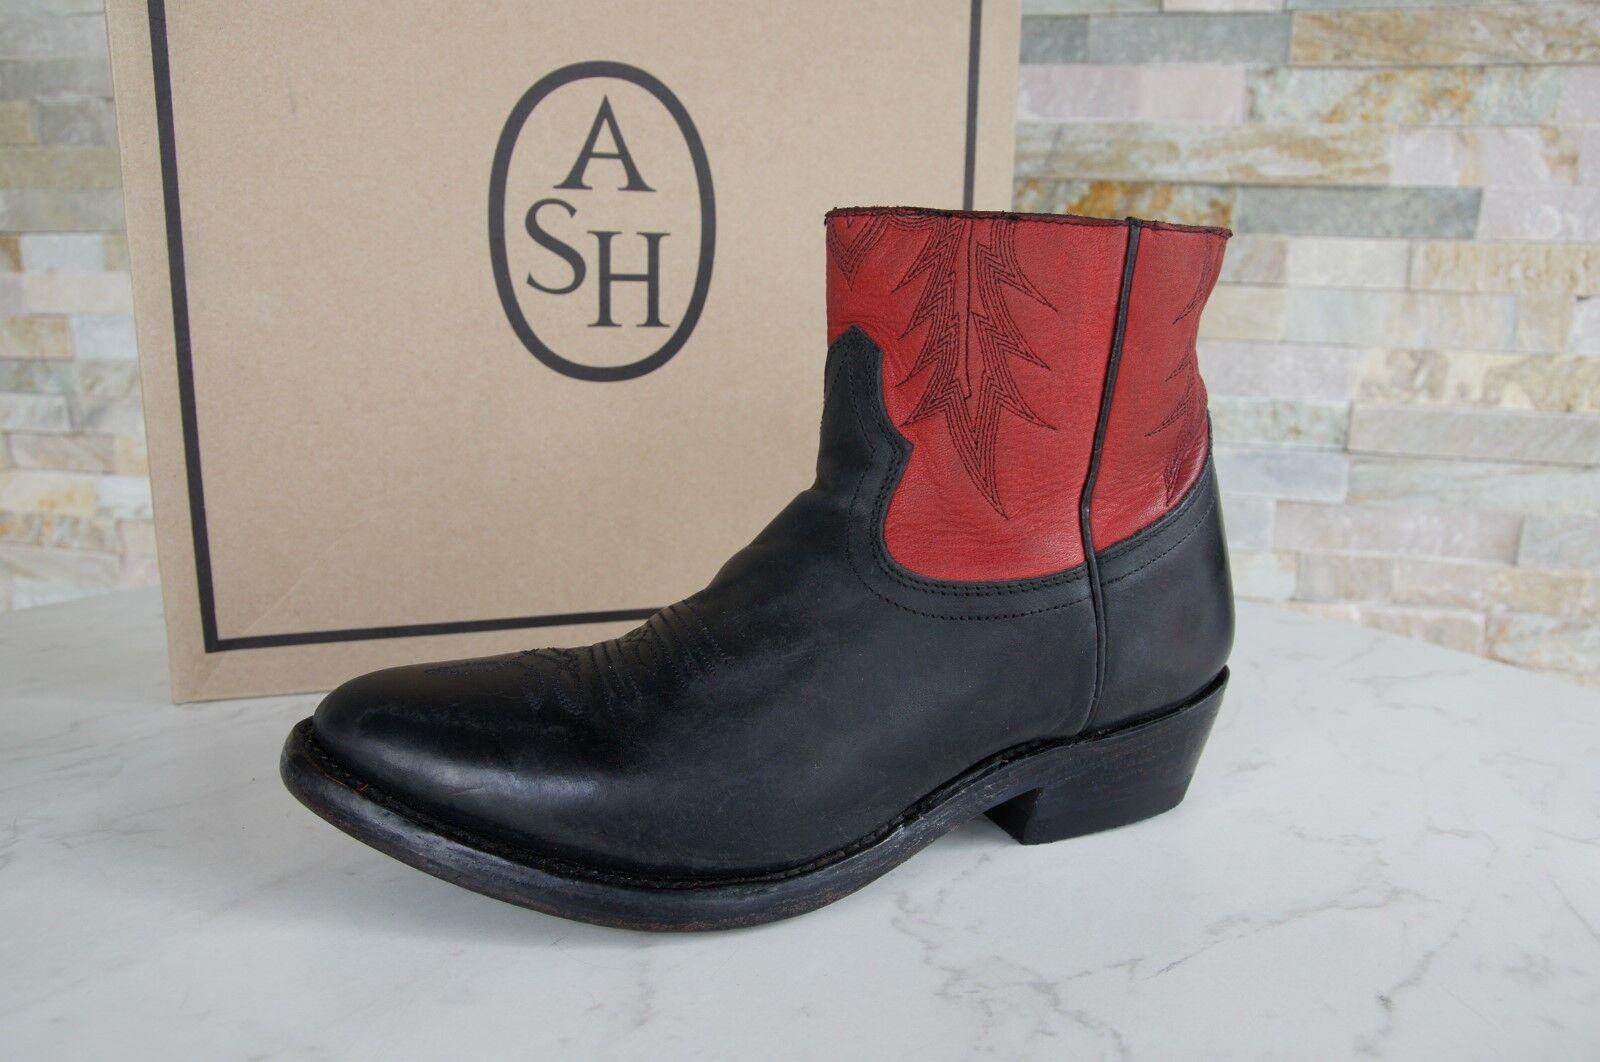 ASH Gr 37,5 Schuhe Stiefeletten Country Vintage Kut schwarz rot neu ehem